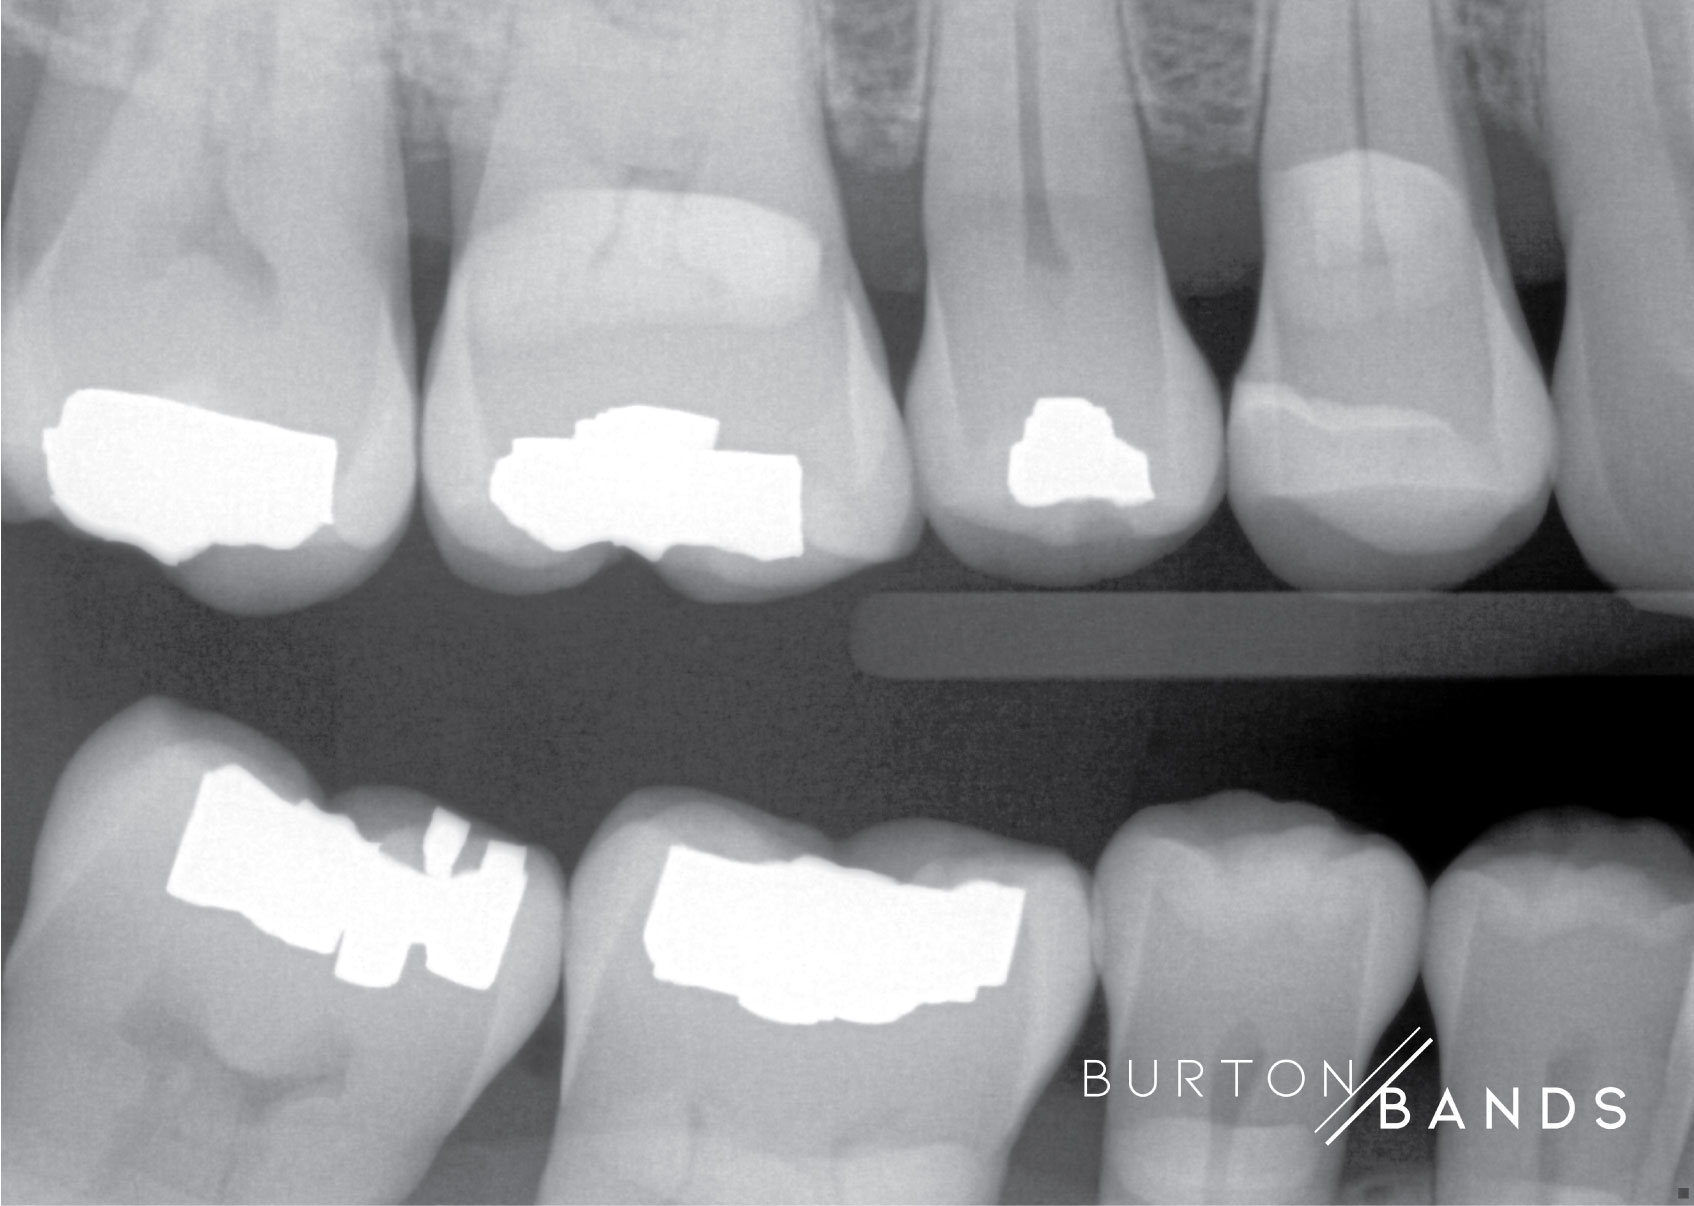 burton-image-2.jpg